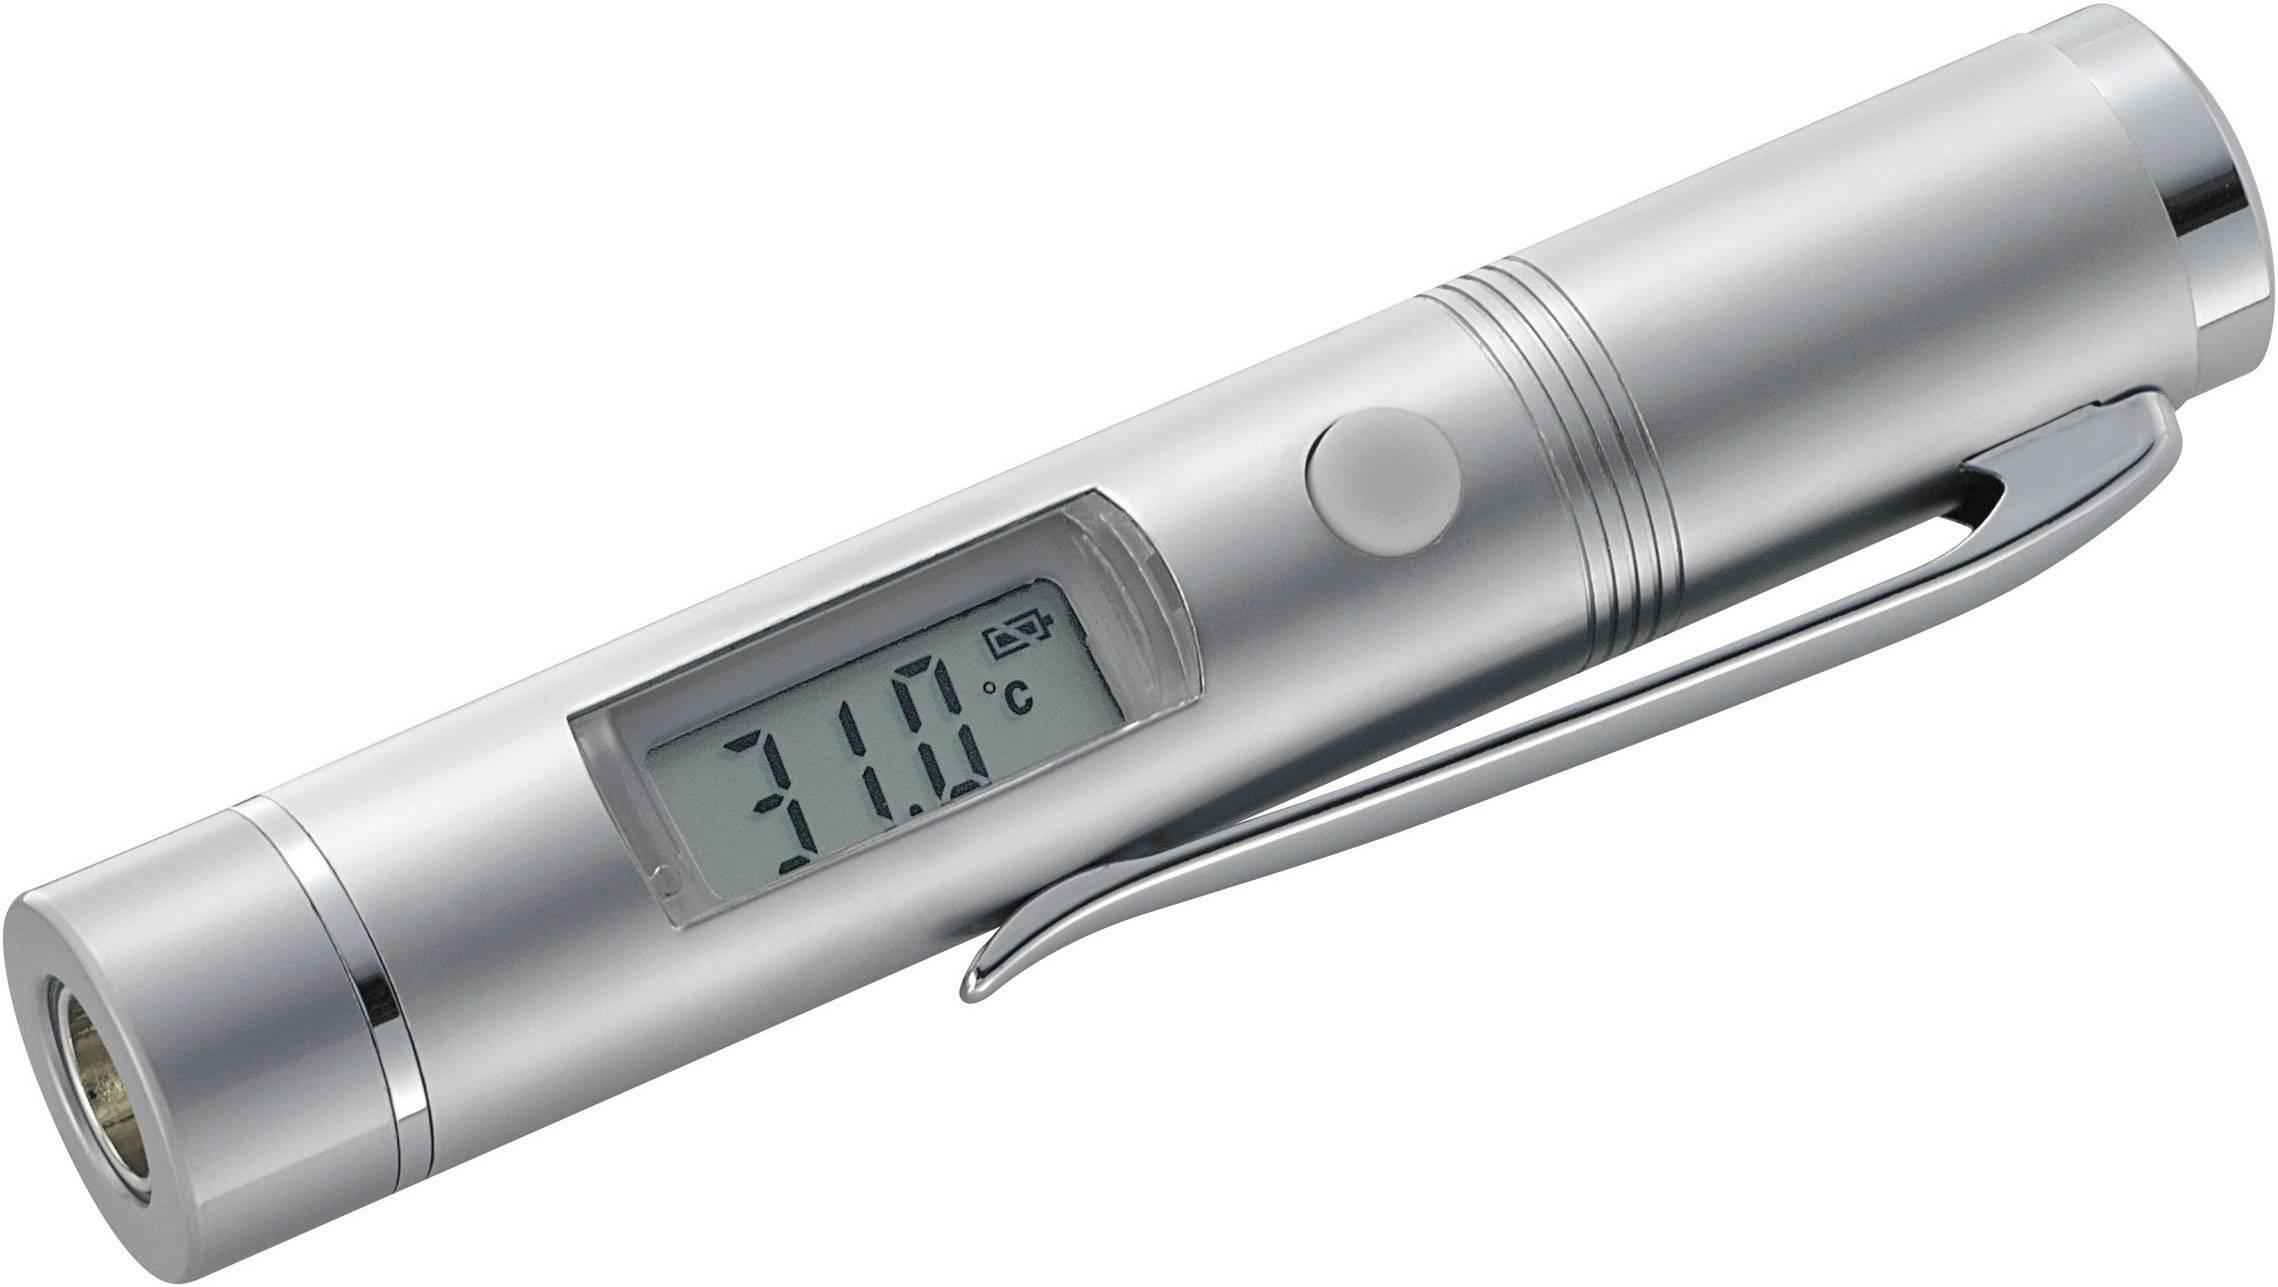 Infračervený teplomer Basetech MINI 1, Optika 1:1, -33 do +220 °C